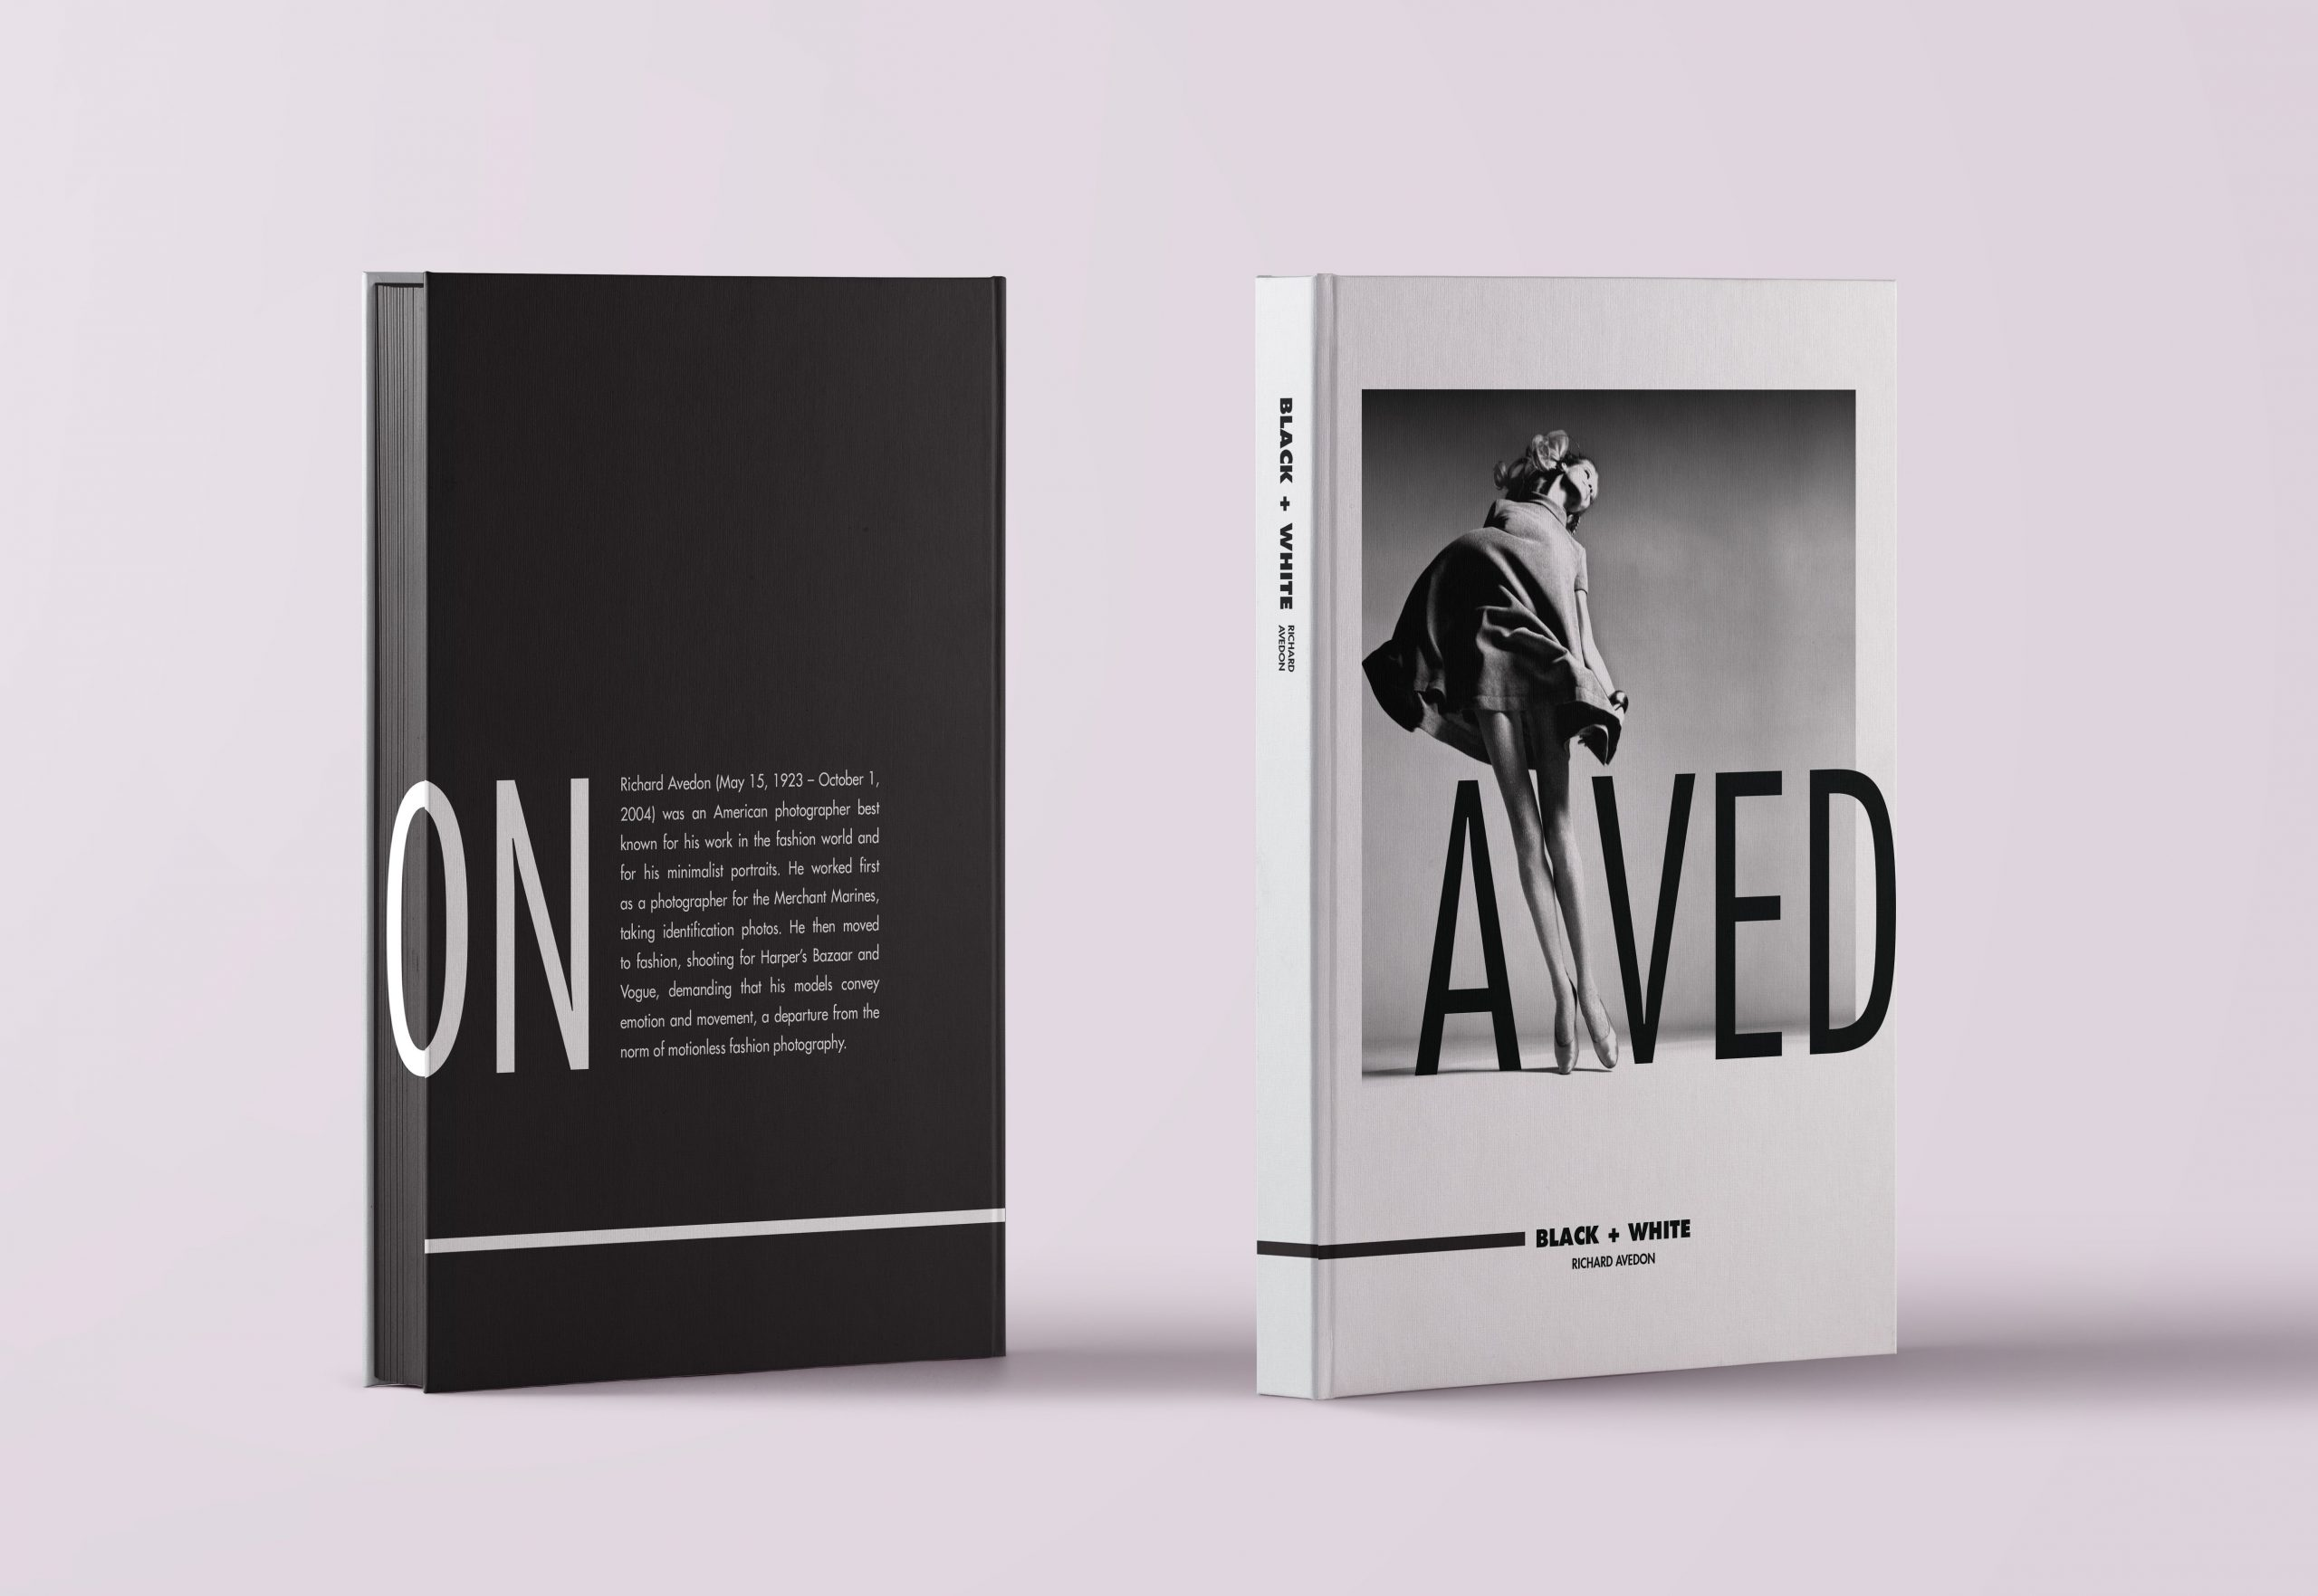 blackwhite-richardavedon-mockup-book